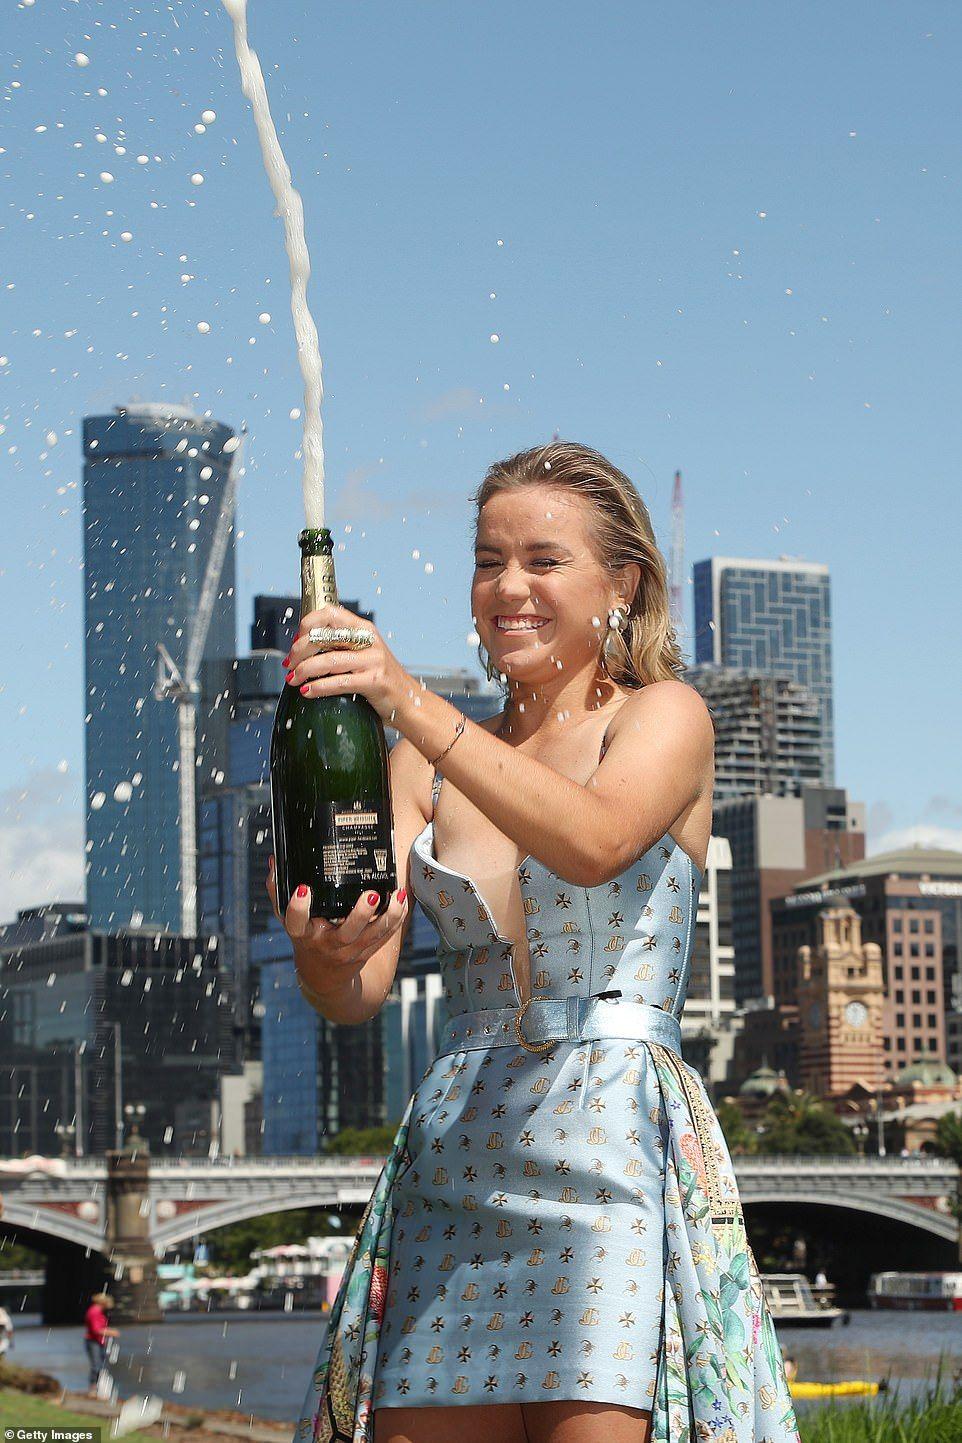 Sofia Kenin Pops Champagne After Winning Australian Open In 2020 Photoshoot Australian Open Anna Kournikova